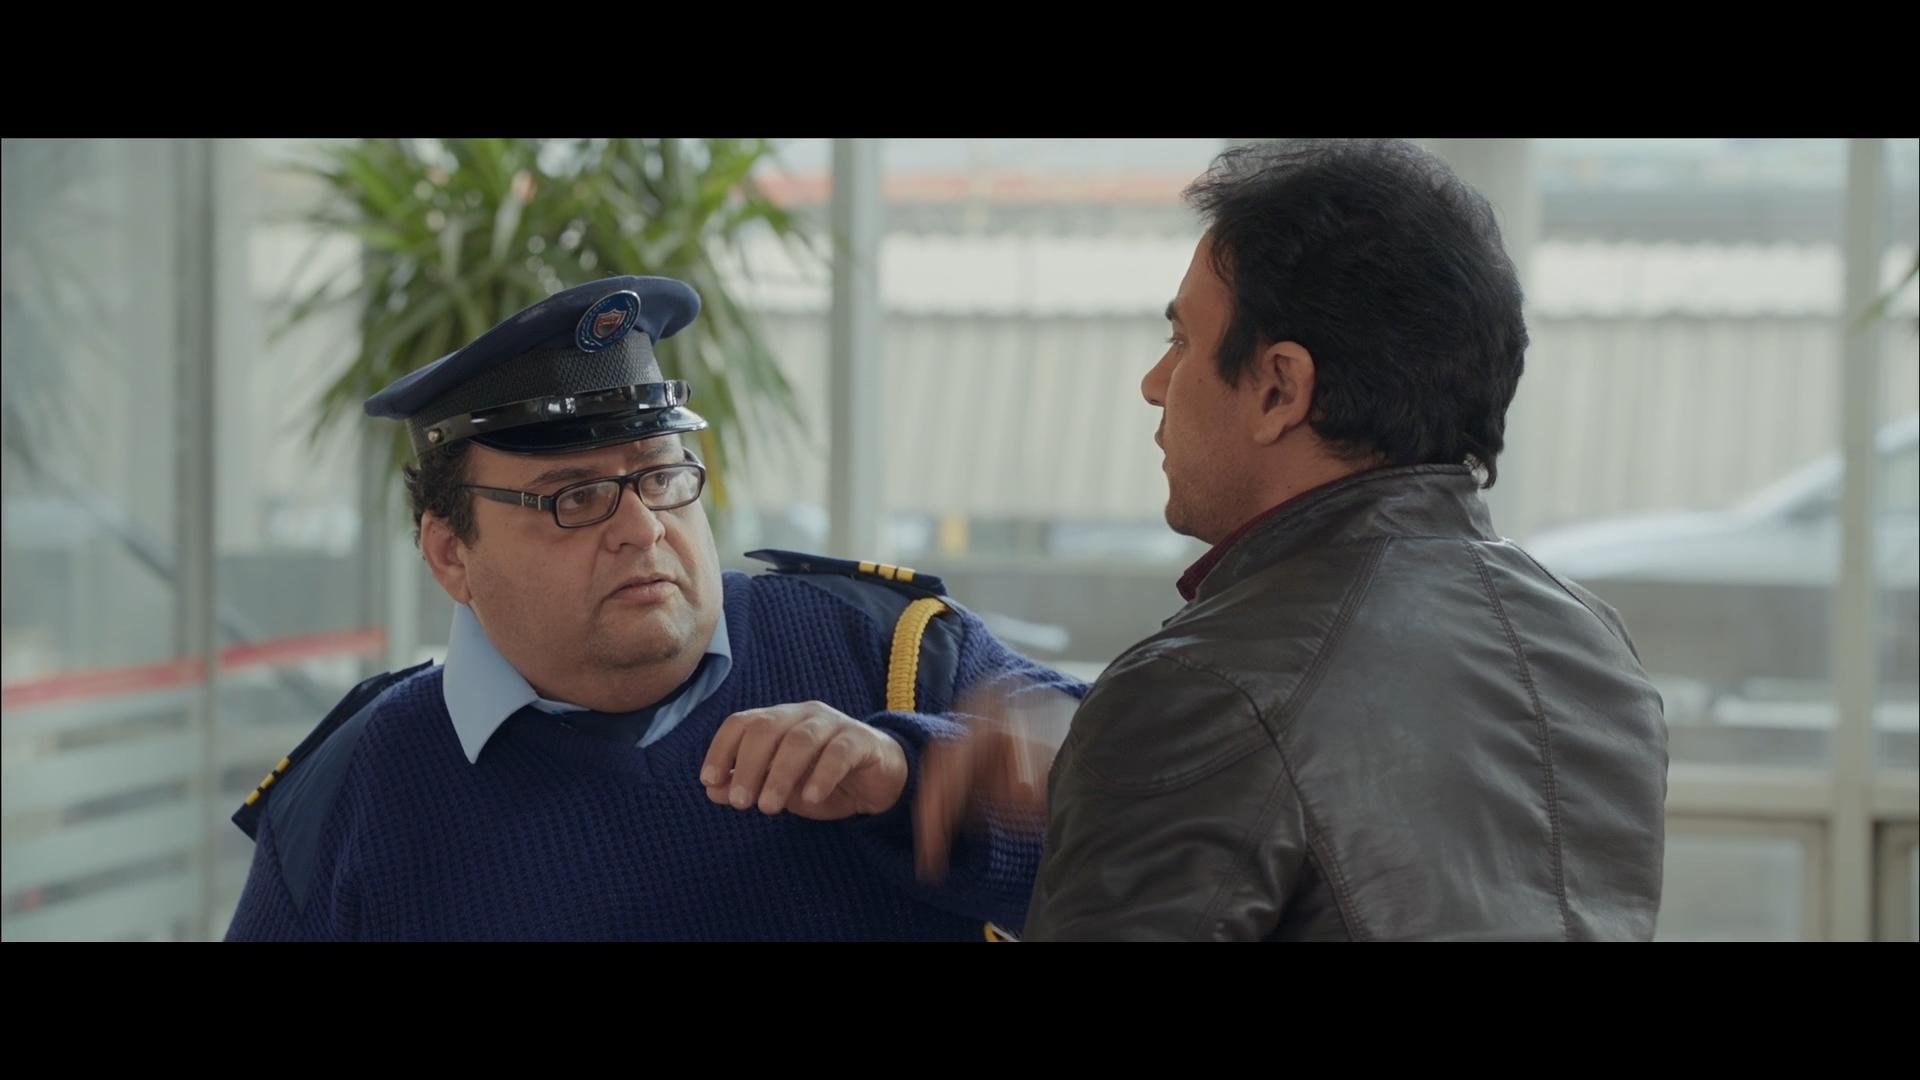 [فيلم][تورنت][تحميل][هروب اضطراري][2017][1080p][Web-DL] 15 arabp2p.com